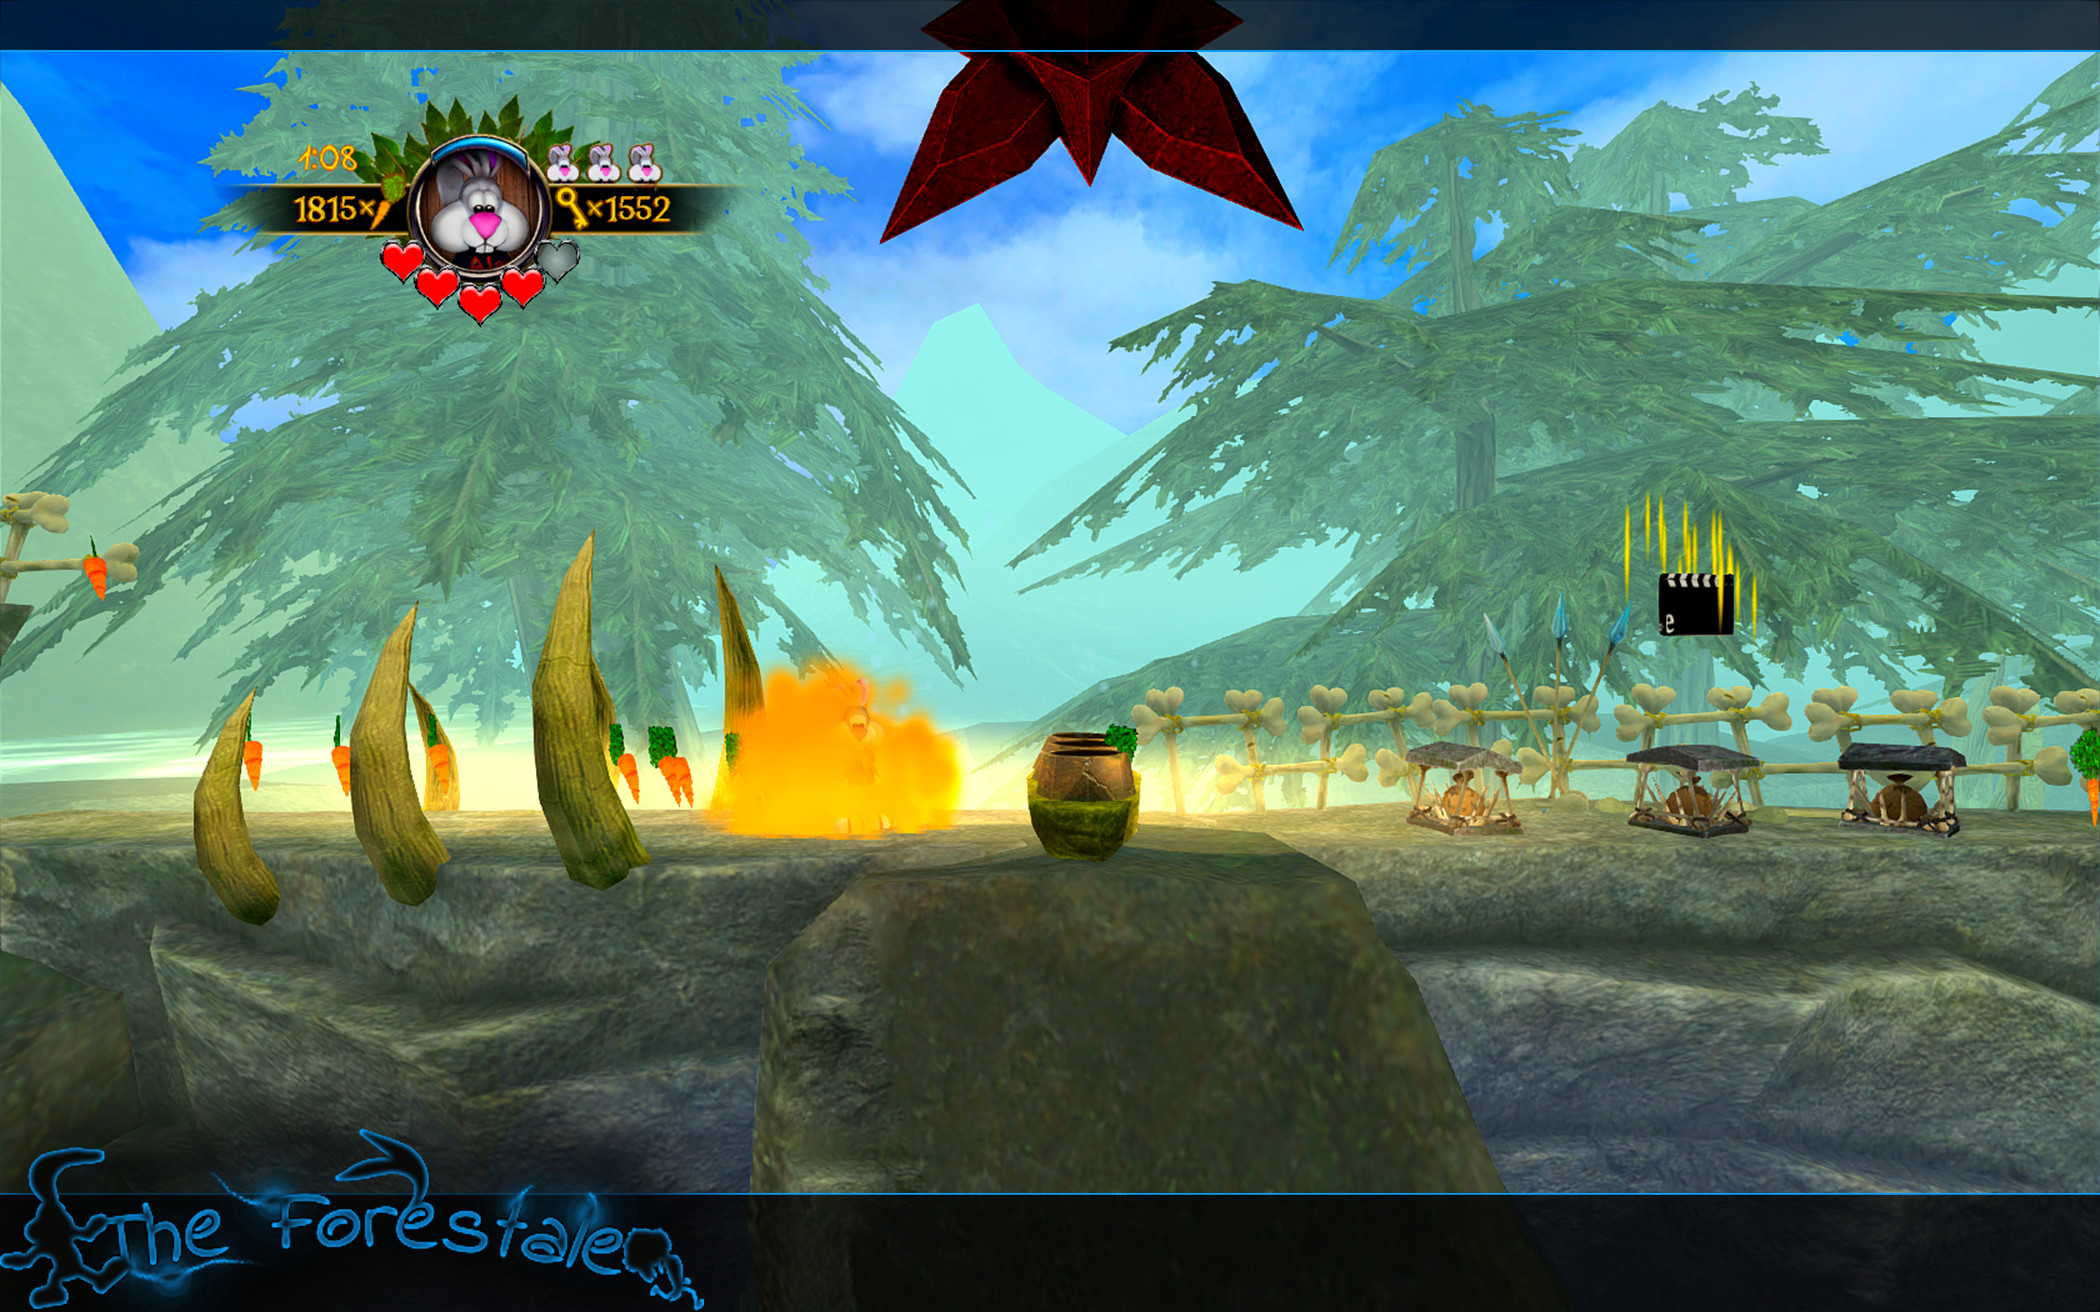 The Forestale screenshot